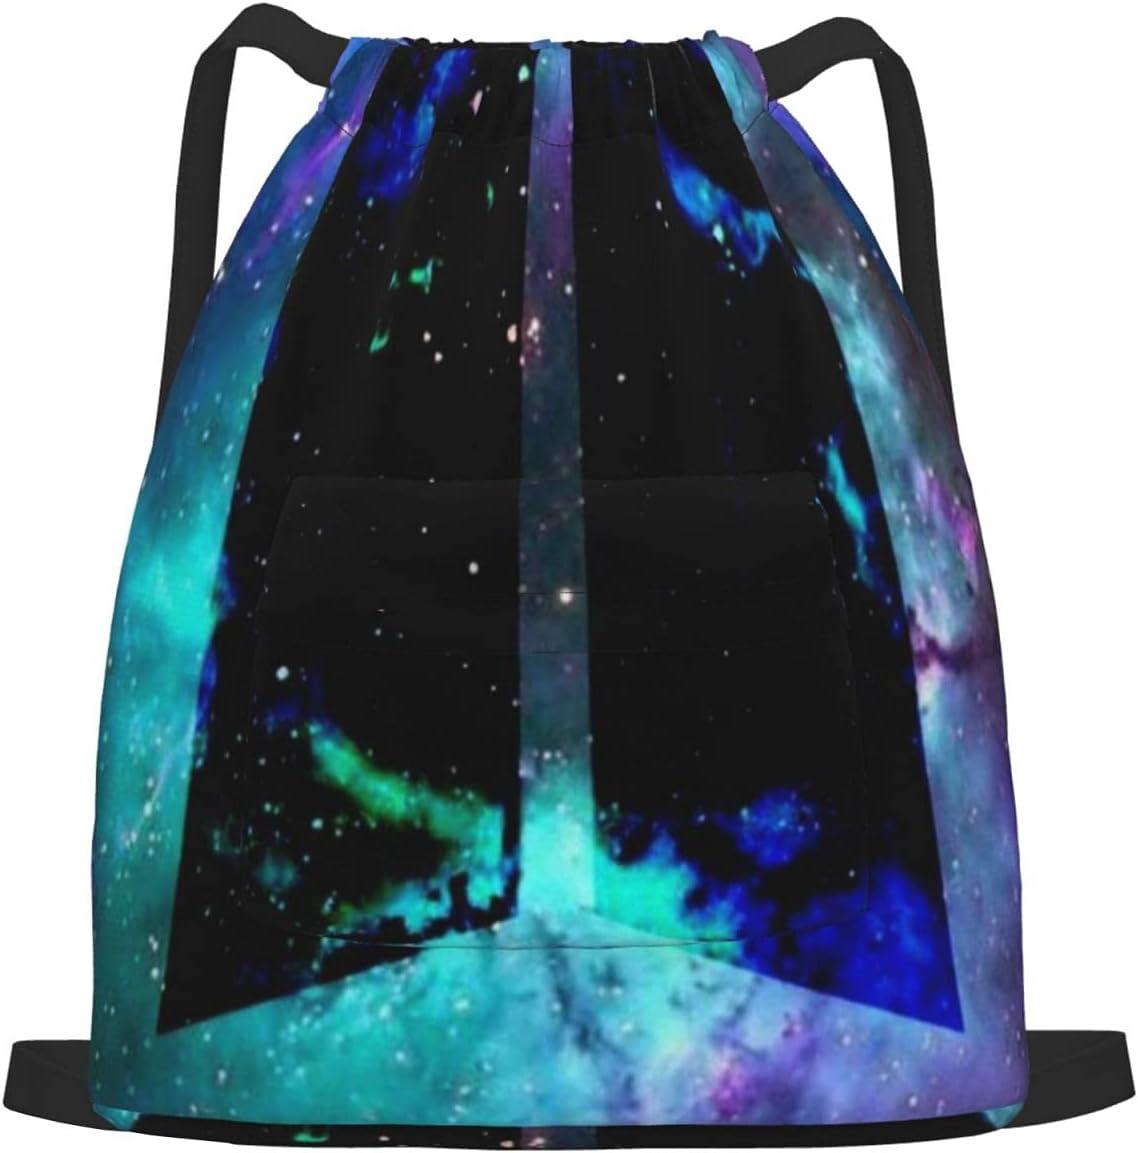 Colored depot Galaxy Drawstring Sports Backpack Bag Yoga Max 63% OFF Gym D